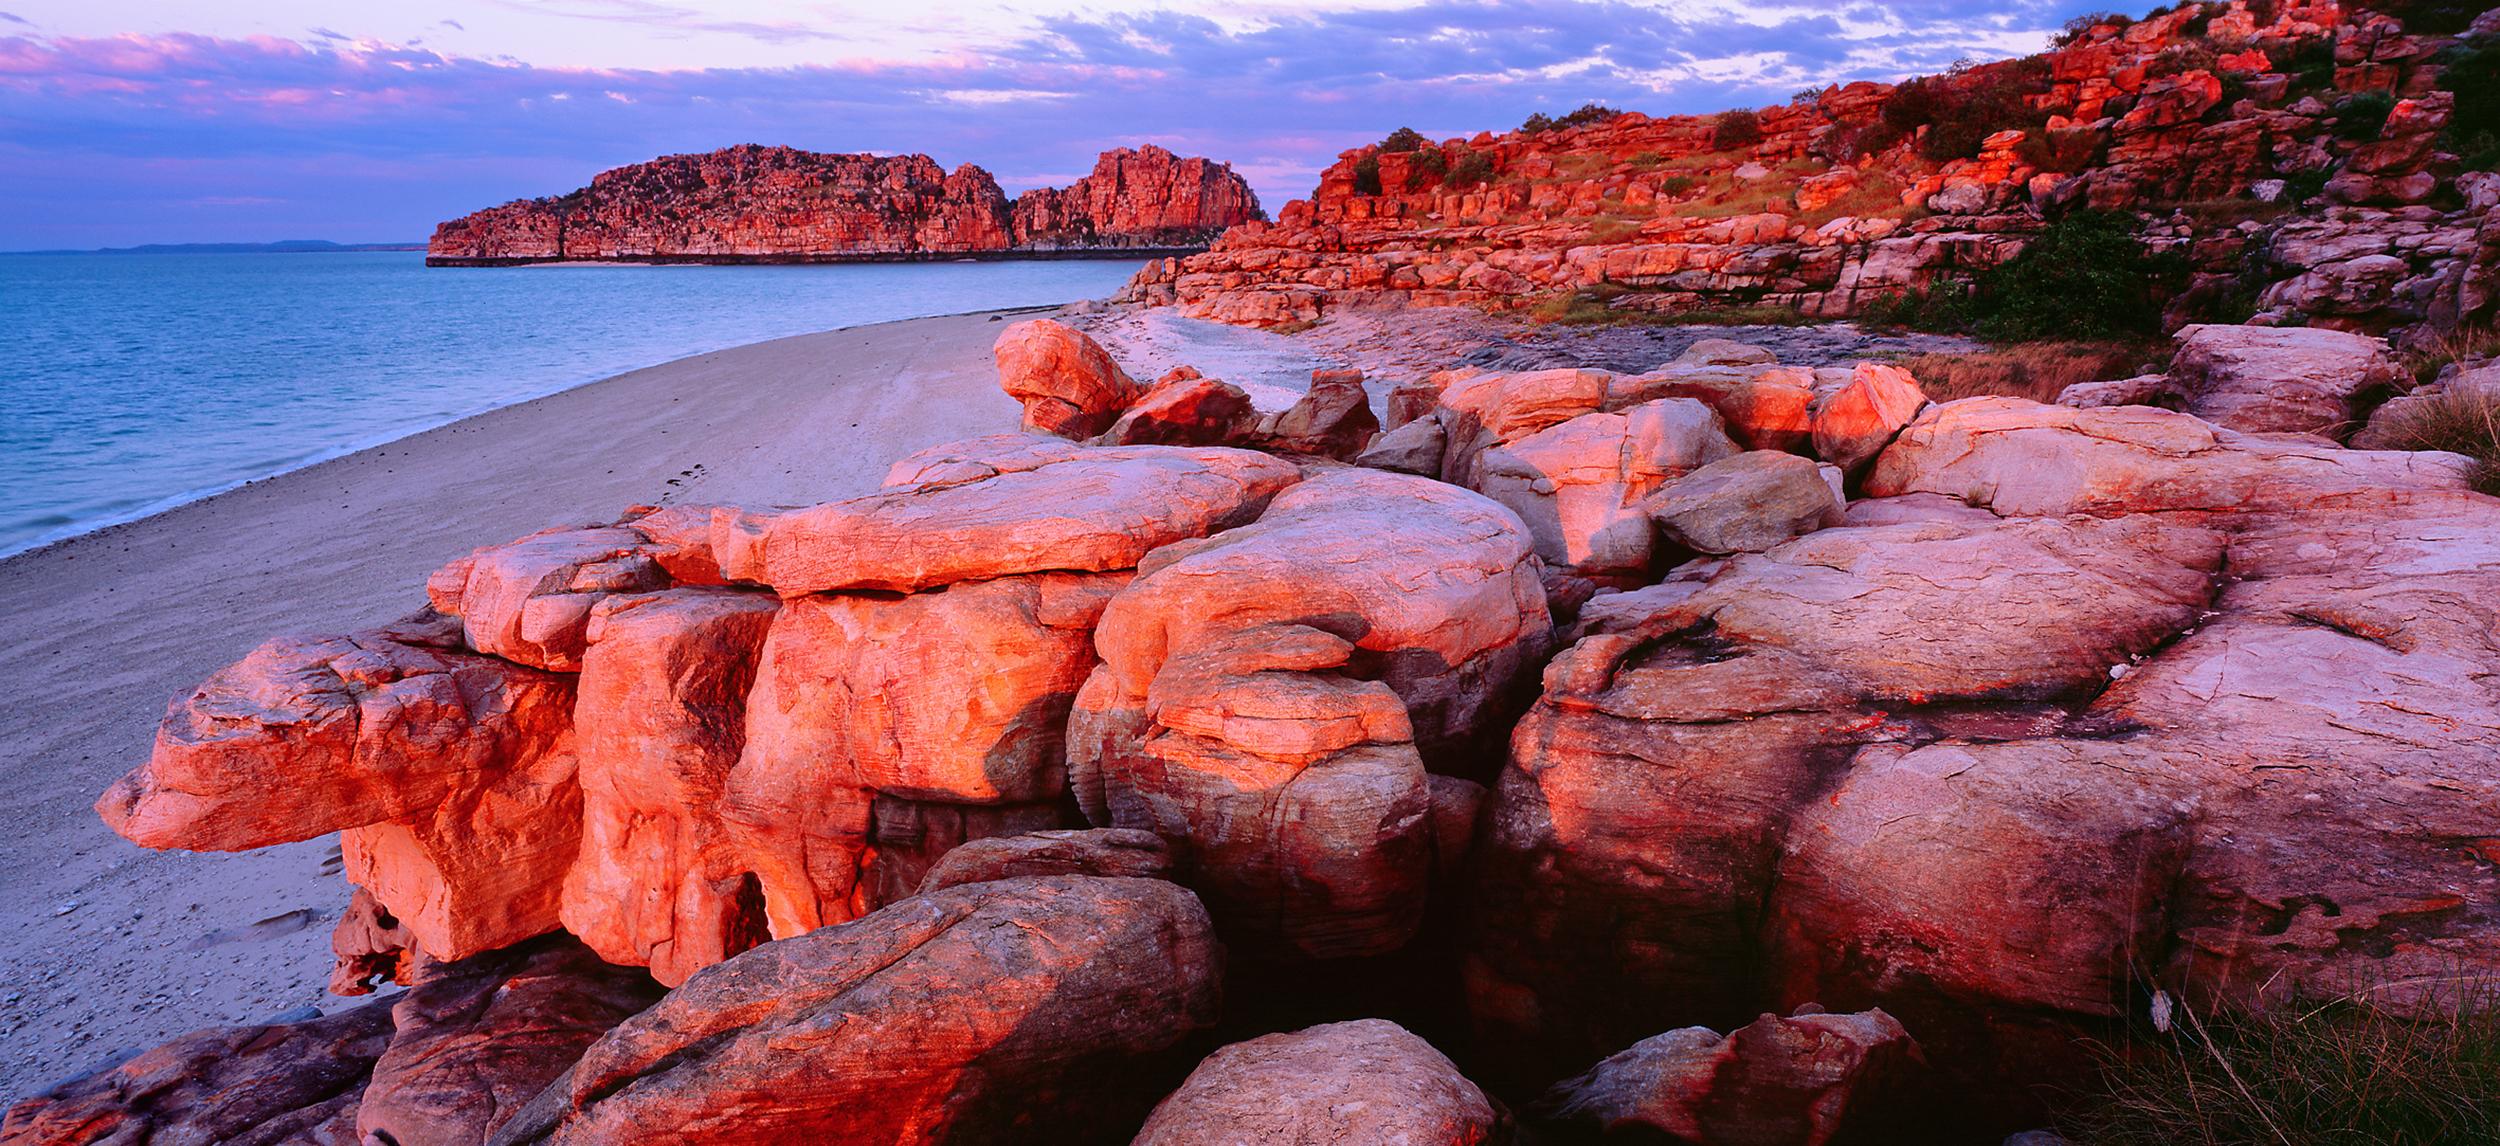 Sunrise, Prudhoe Islands, Kimberley, Western Australia, 2008. Edition of 3.